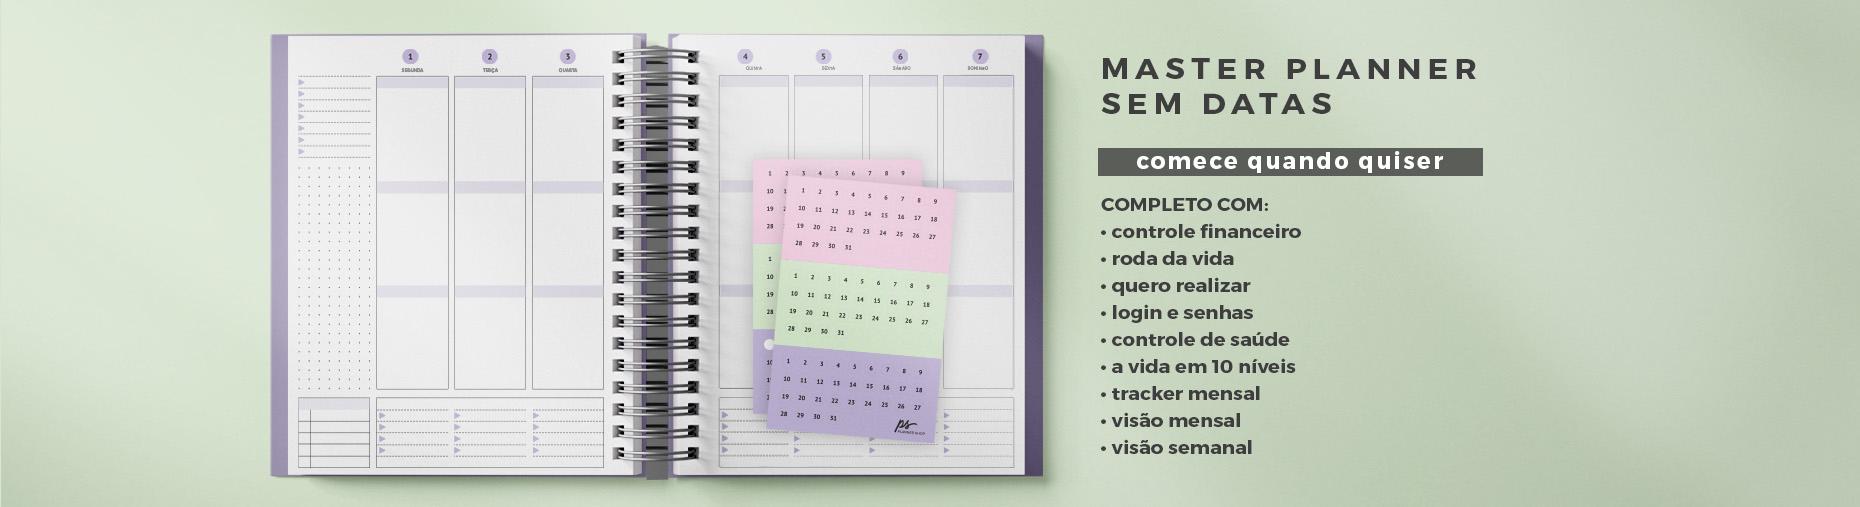 Master Planner Permanente